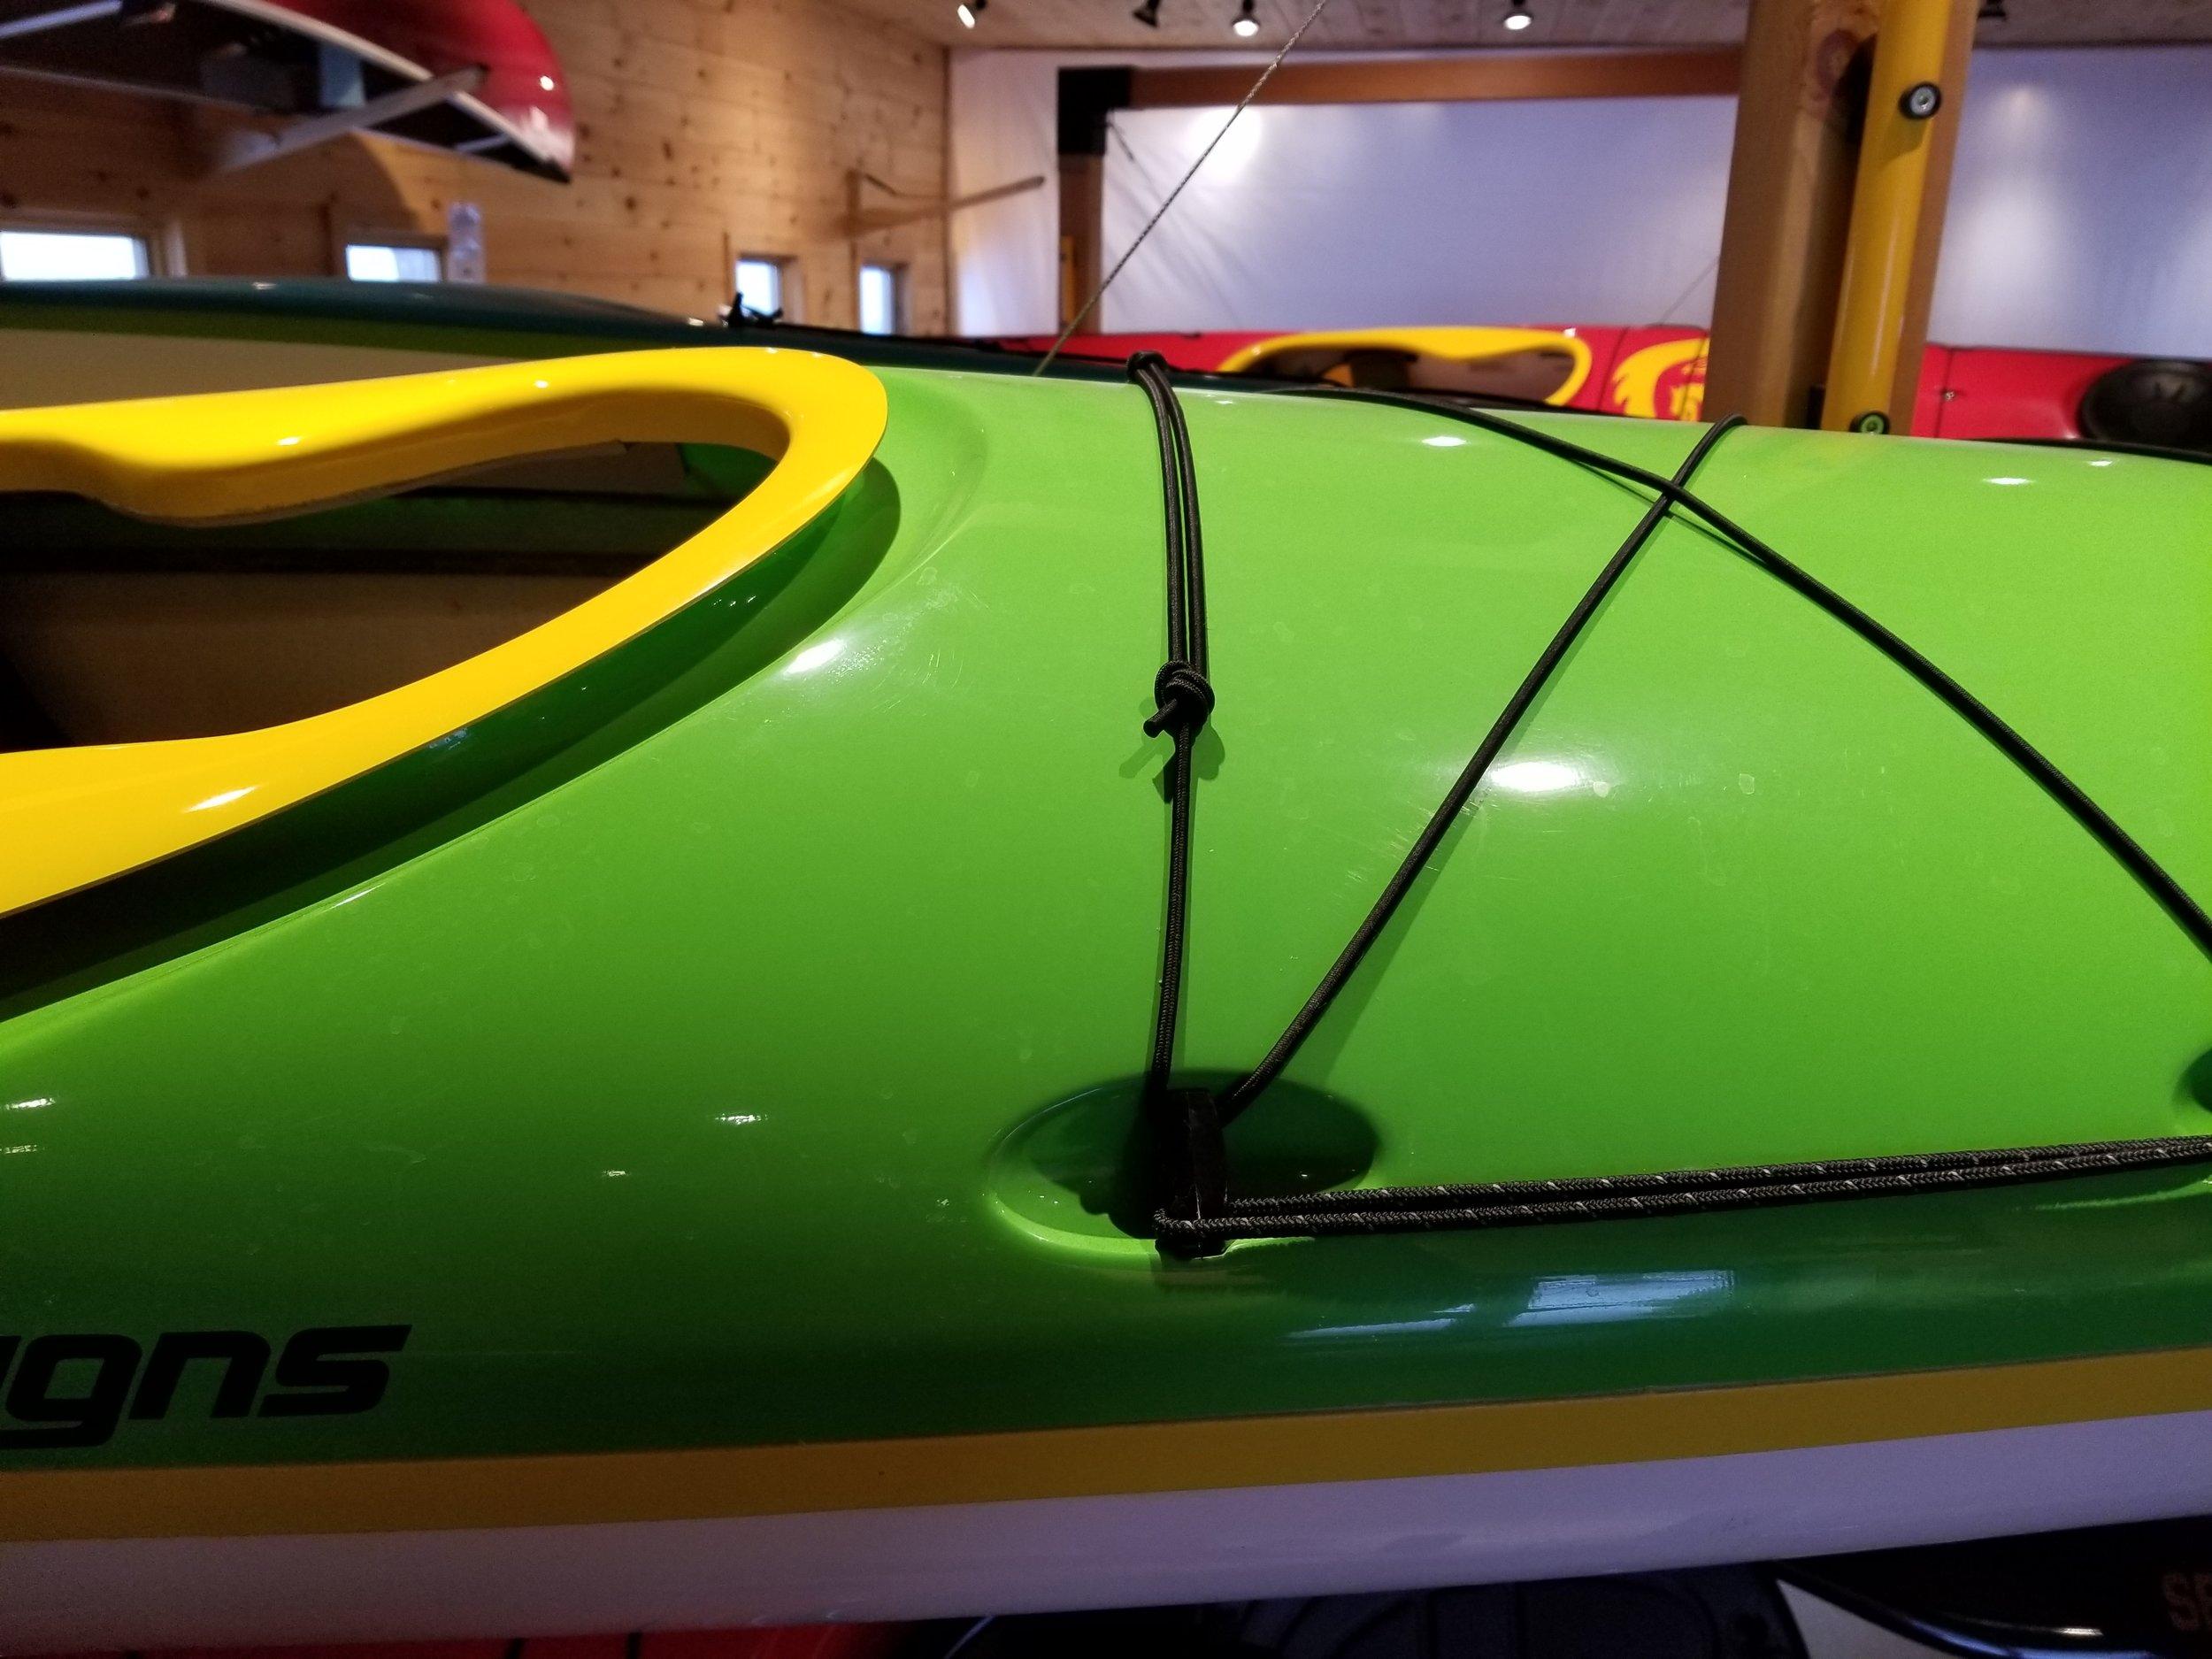 Standard layup. Green deck, white hull, yellow combing and seam.